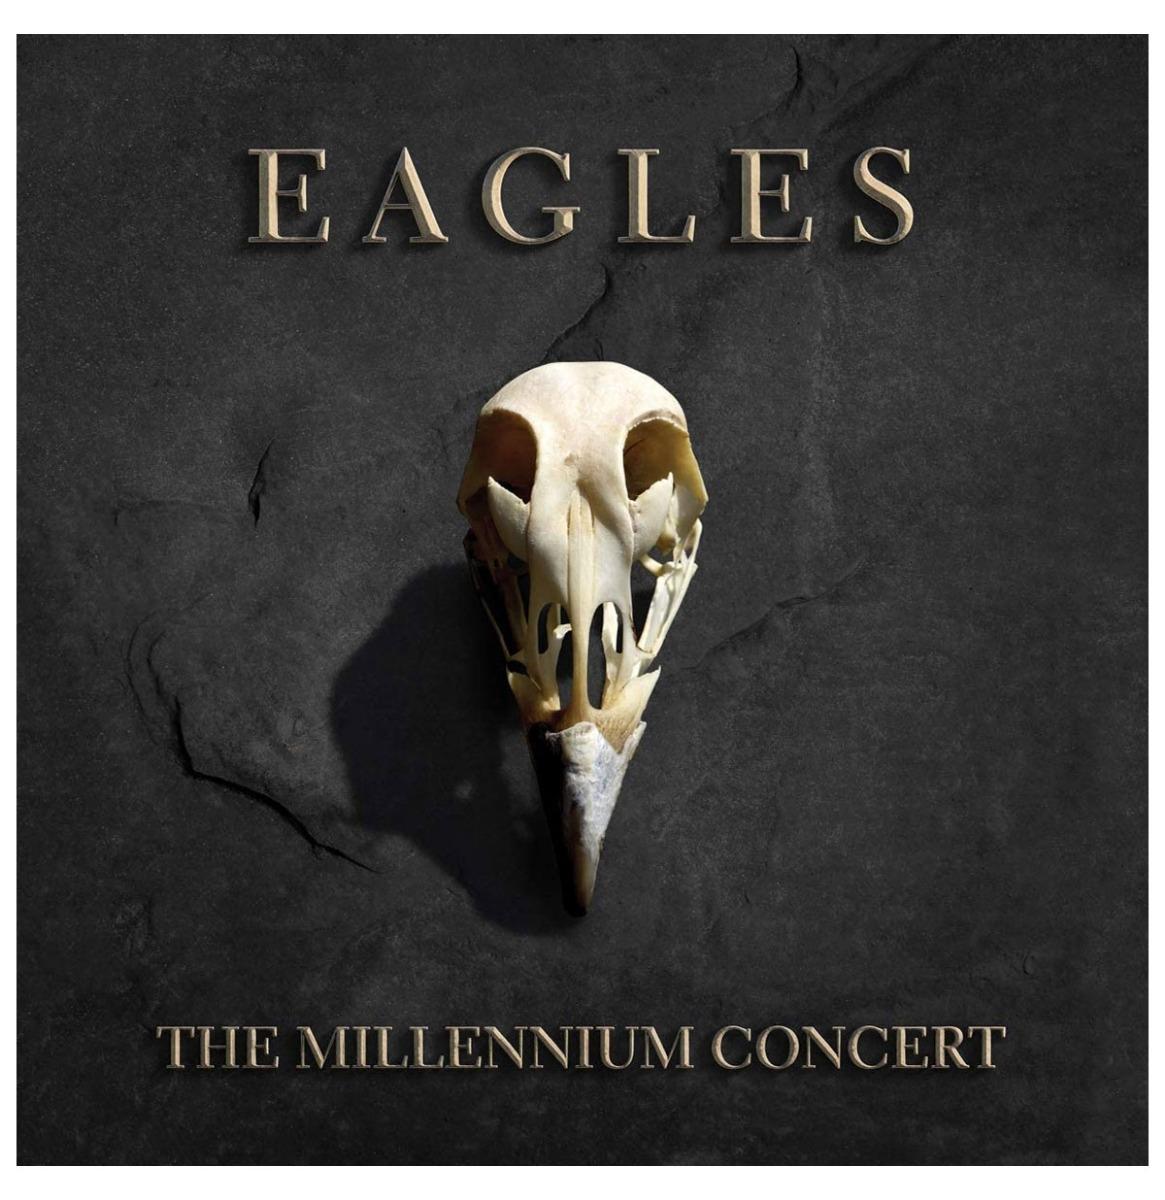 Eagles - The Millennium Concert 2-LP - Beperkte Oplage